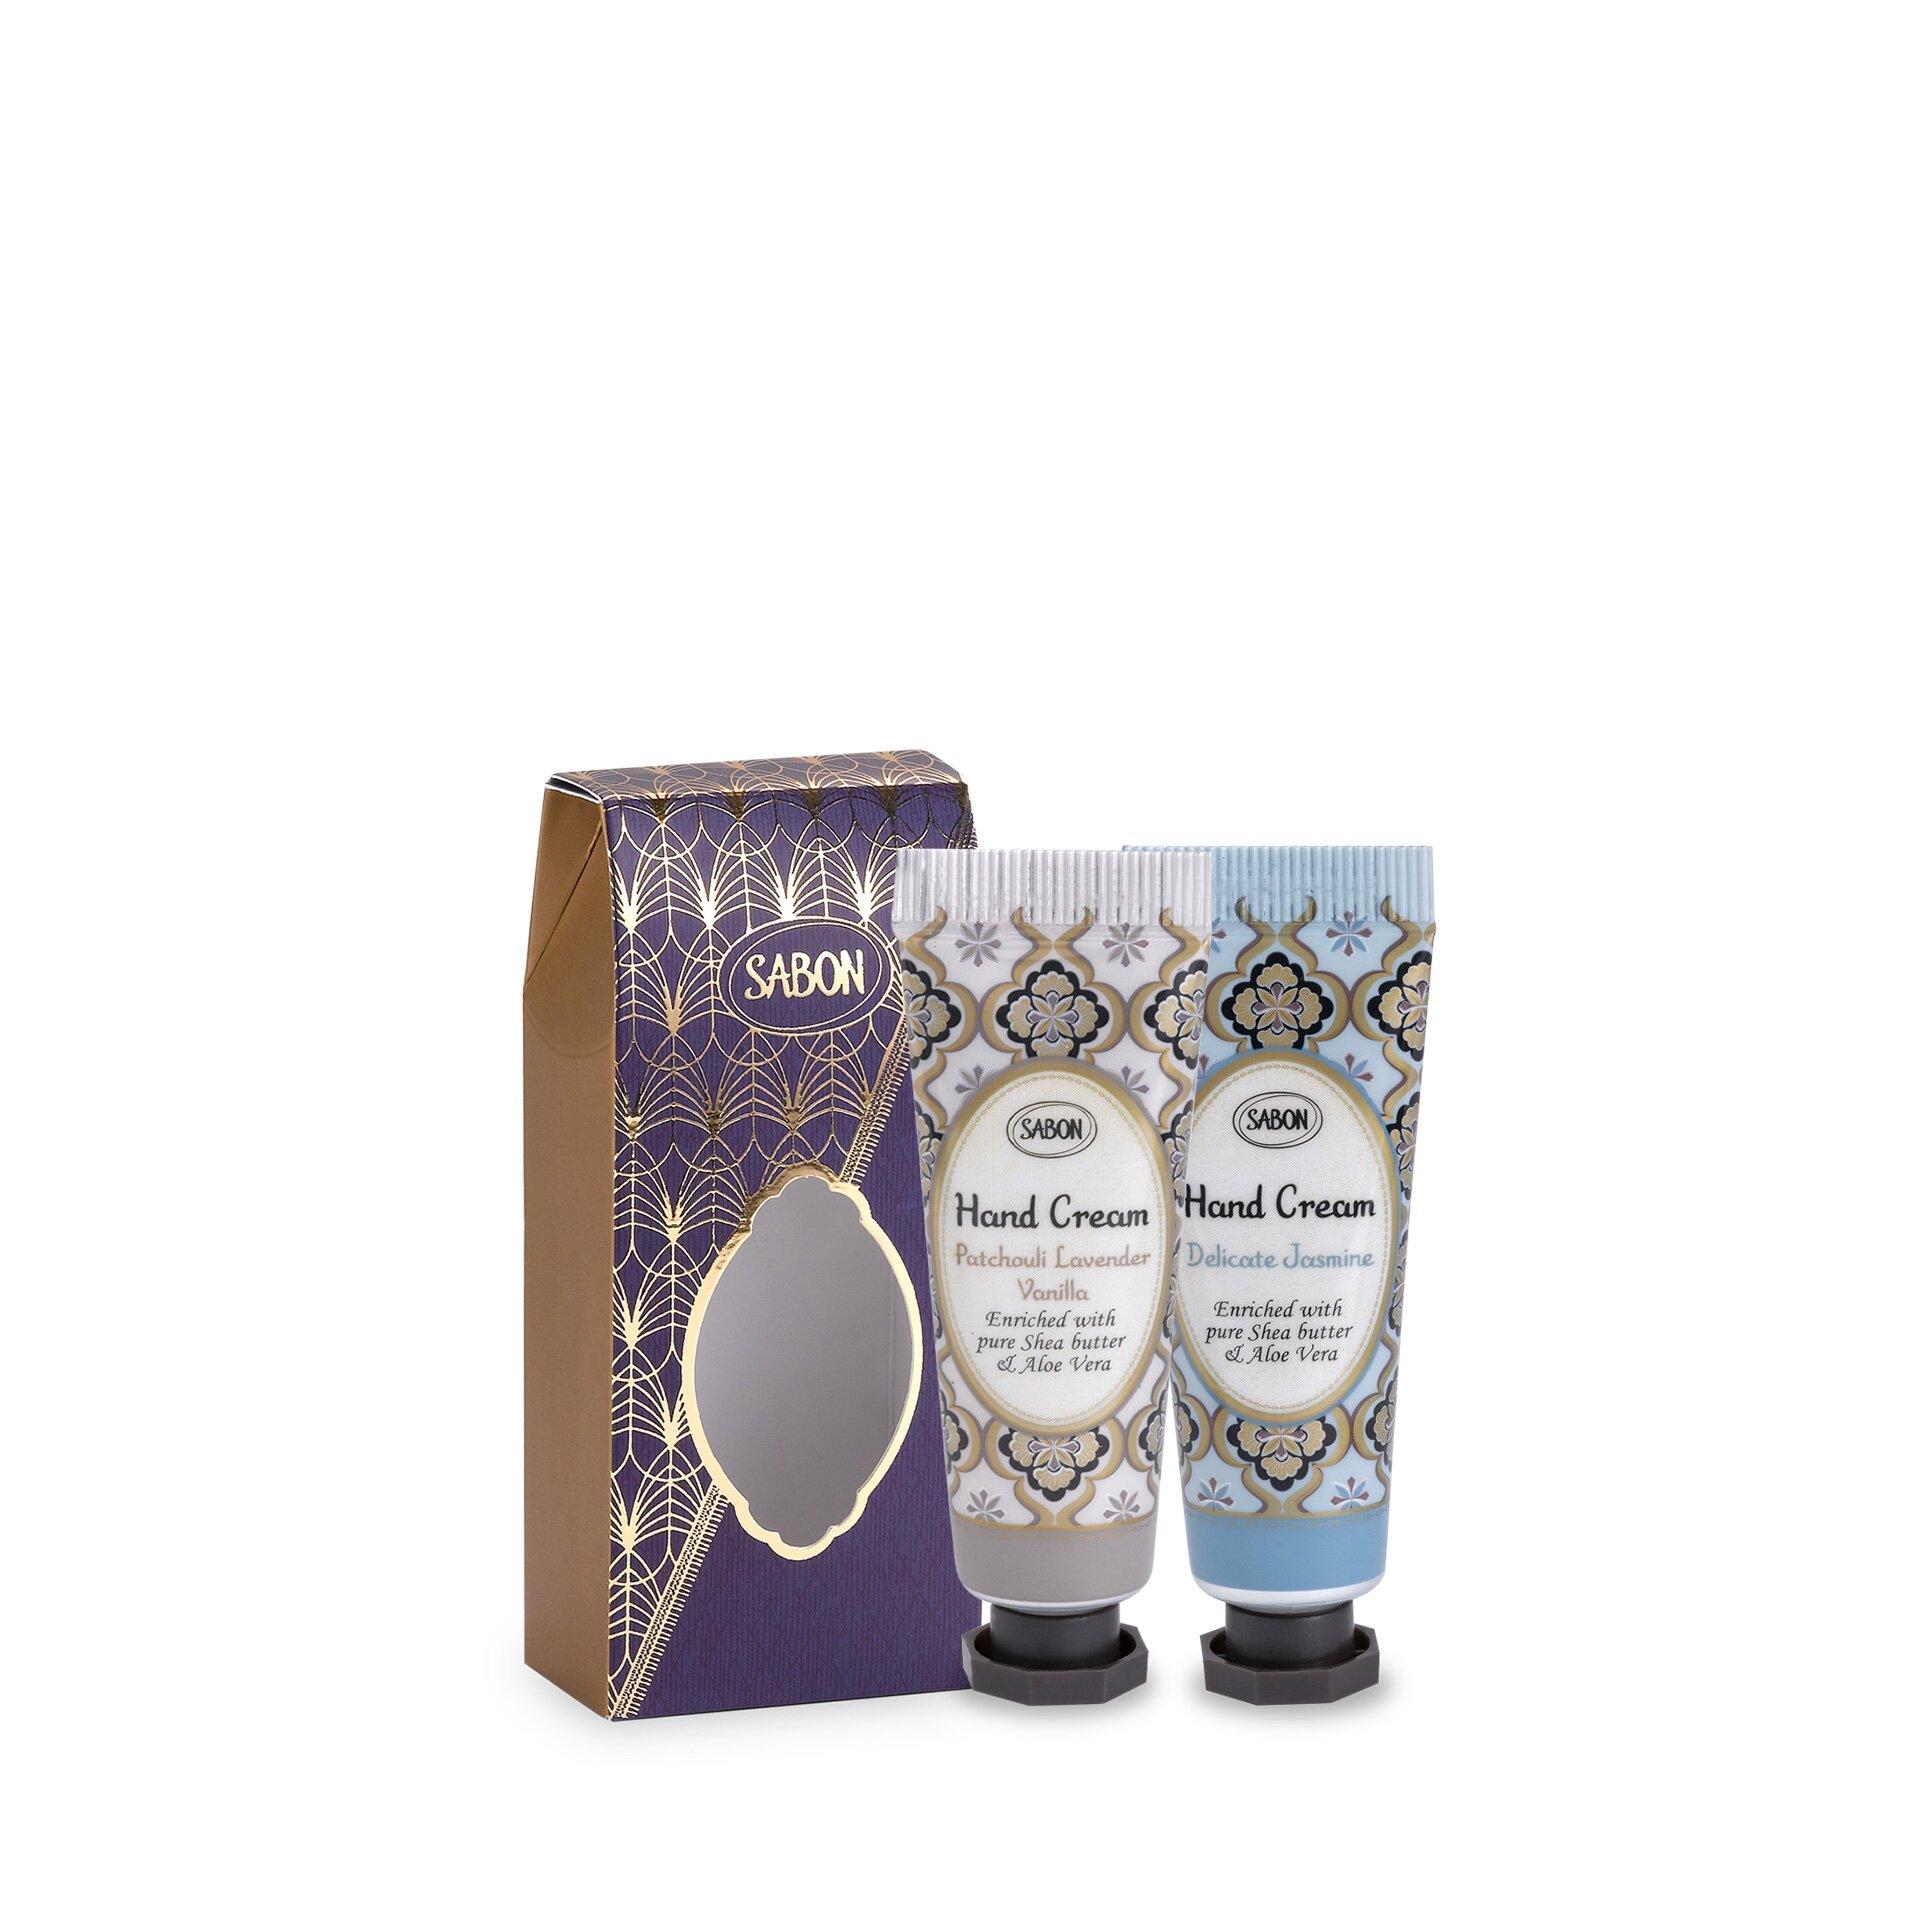 Gift Set Access - Hand Cream - 5